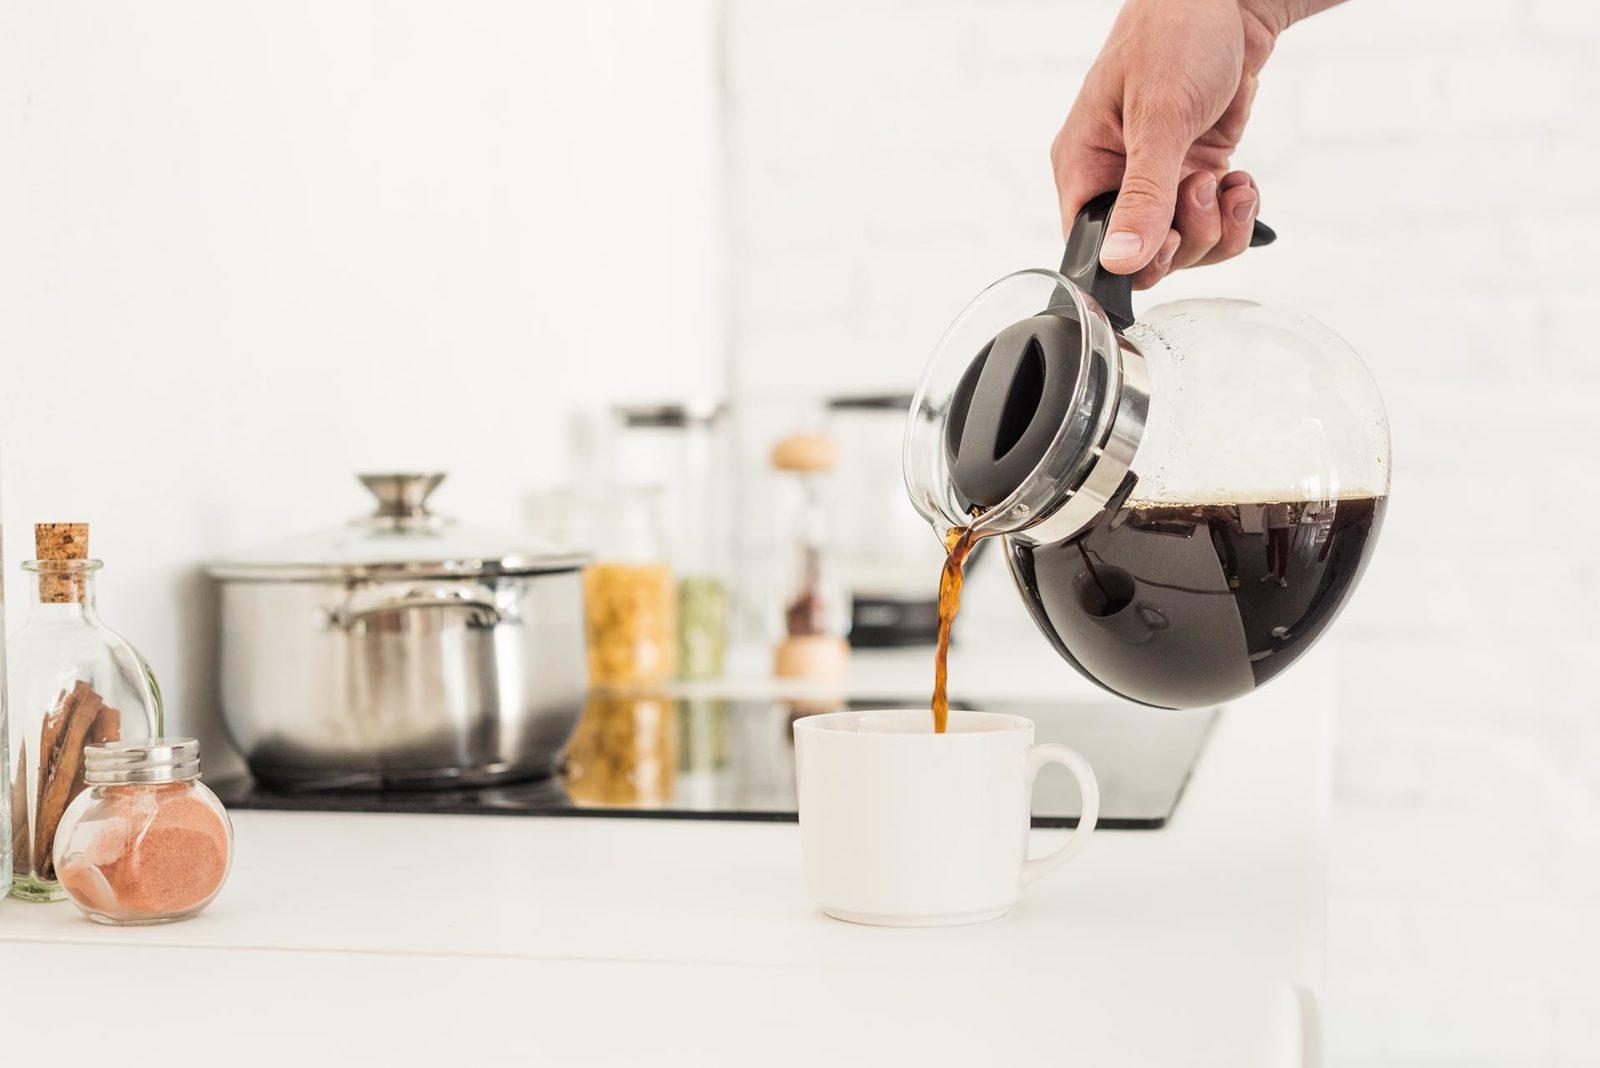 Filterkaffe helles i kaffekopp